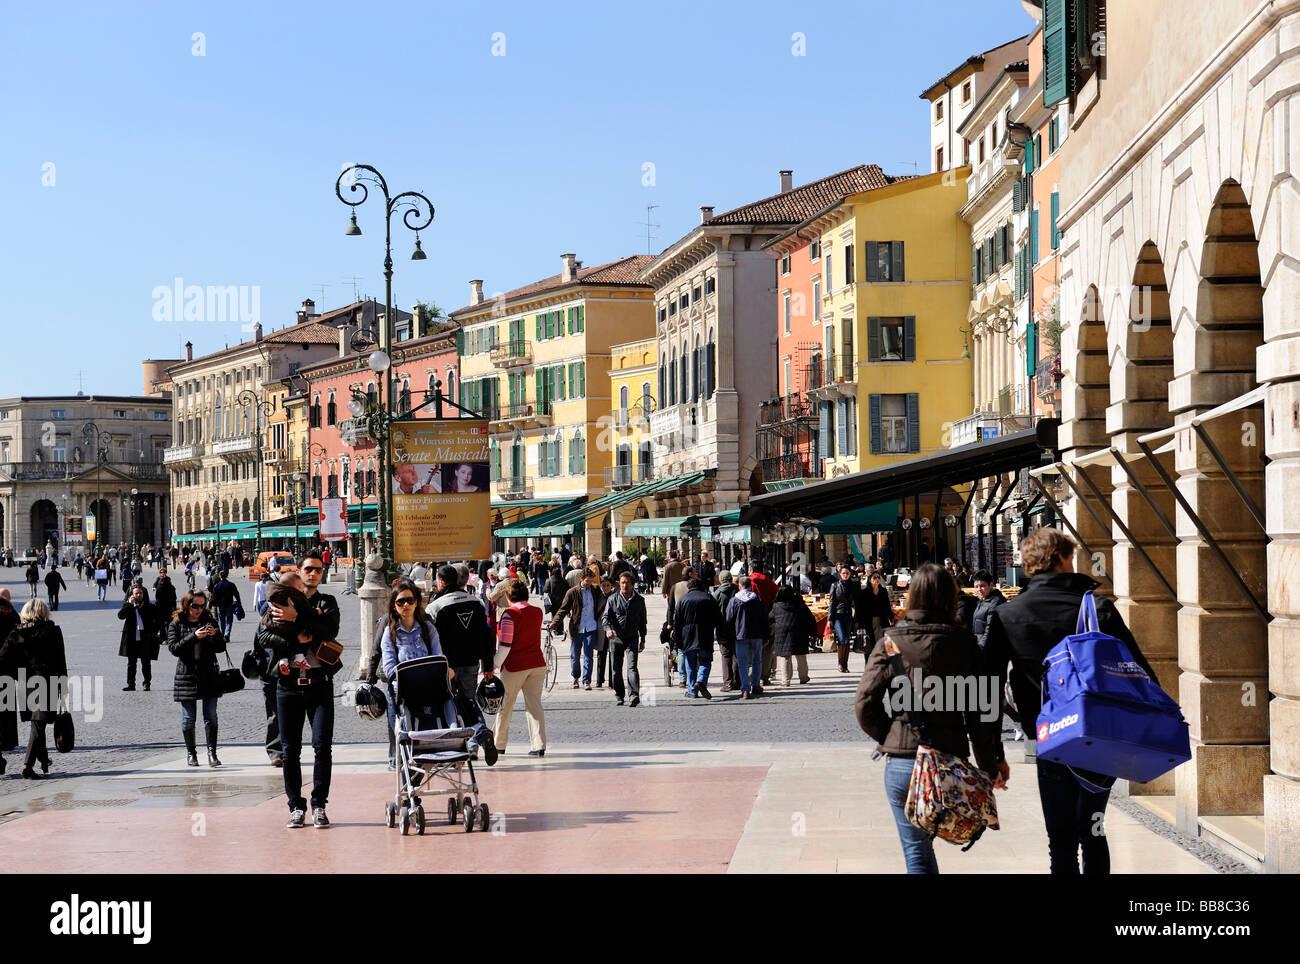 Piazza Erbe Platz, Verona, Gardasee, Italien, Europa Stockbild